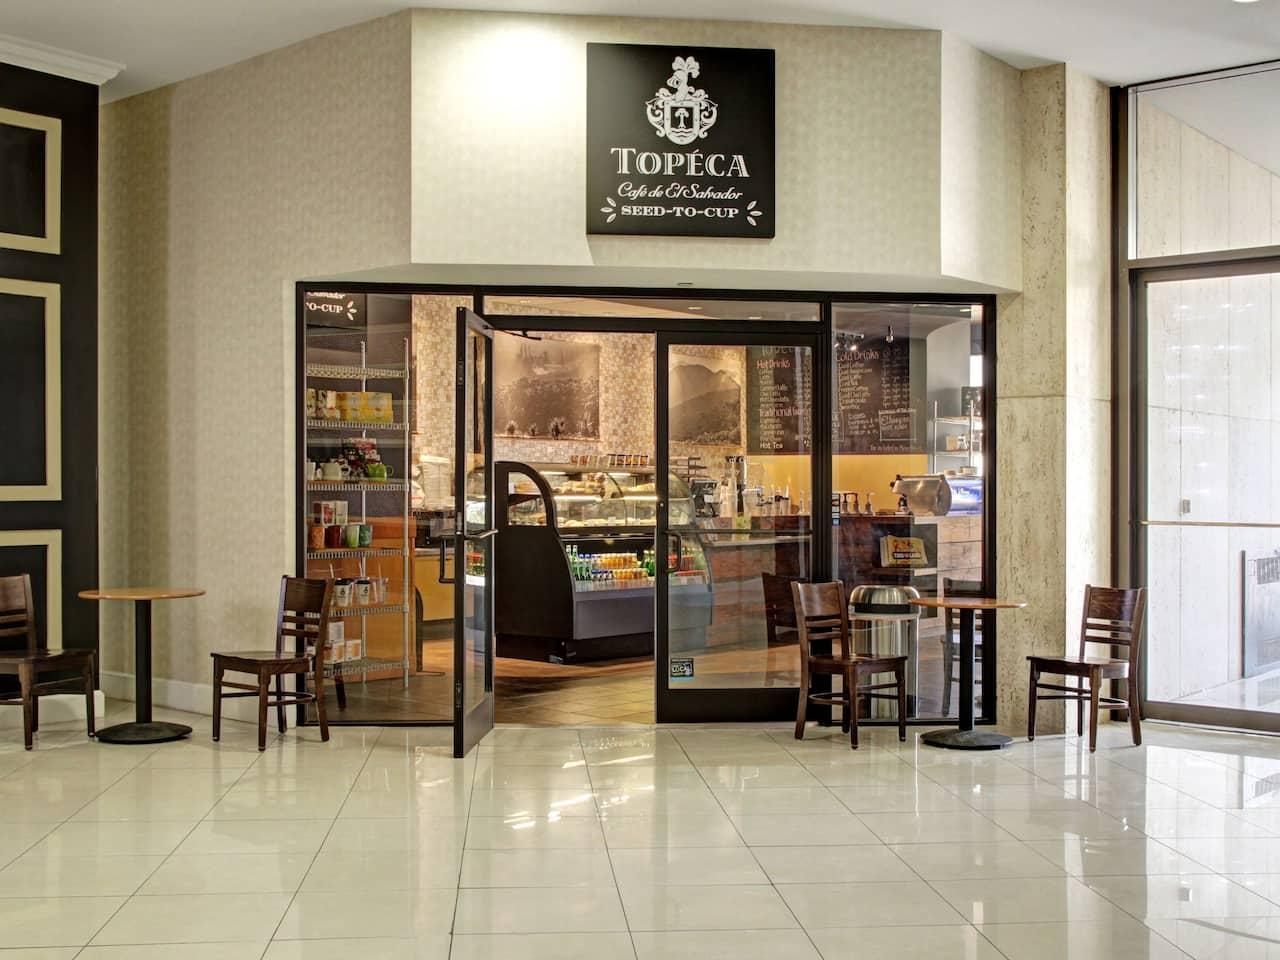 Topeca Coffee